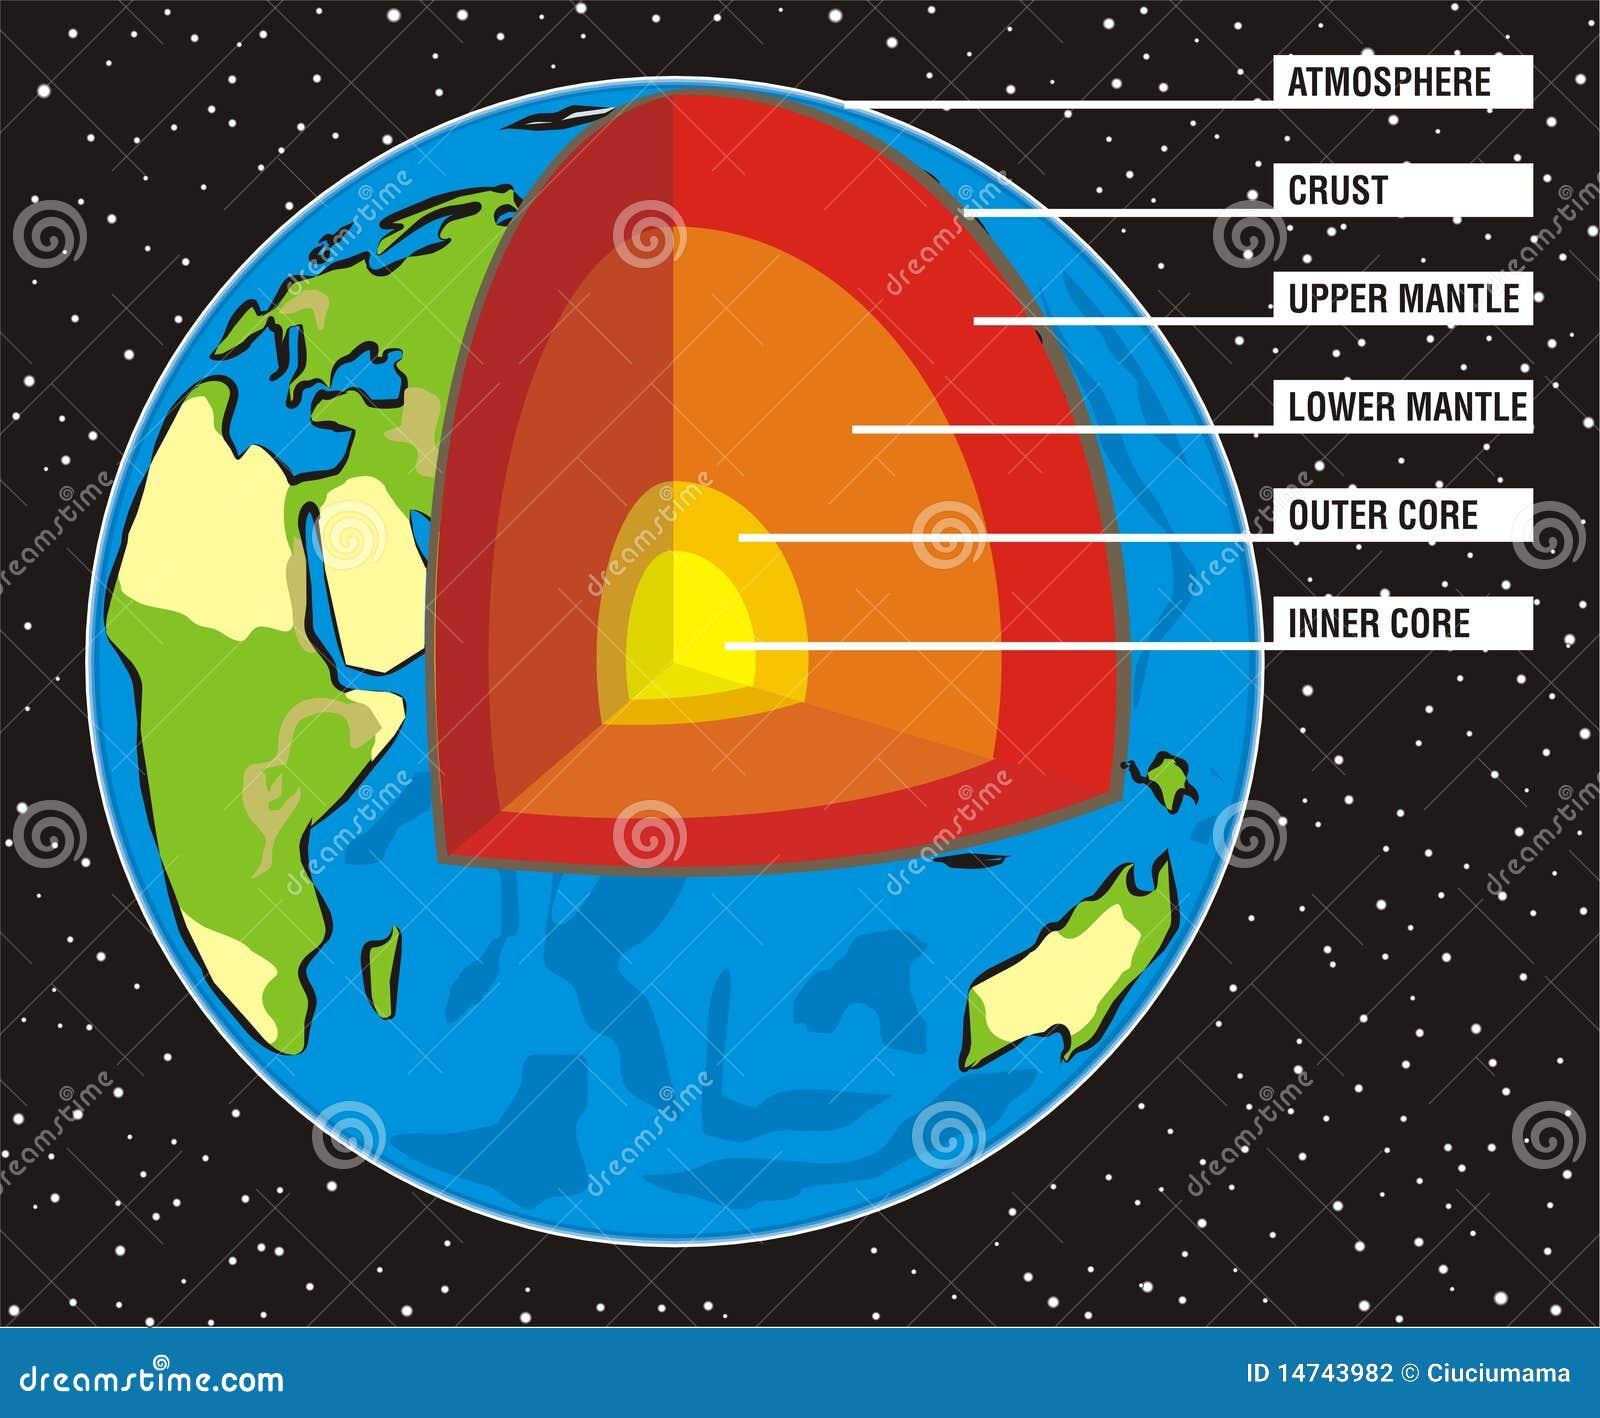 Interior Design Facts lovely interior design information facts #1: earth-s-interior